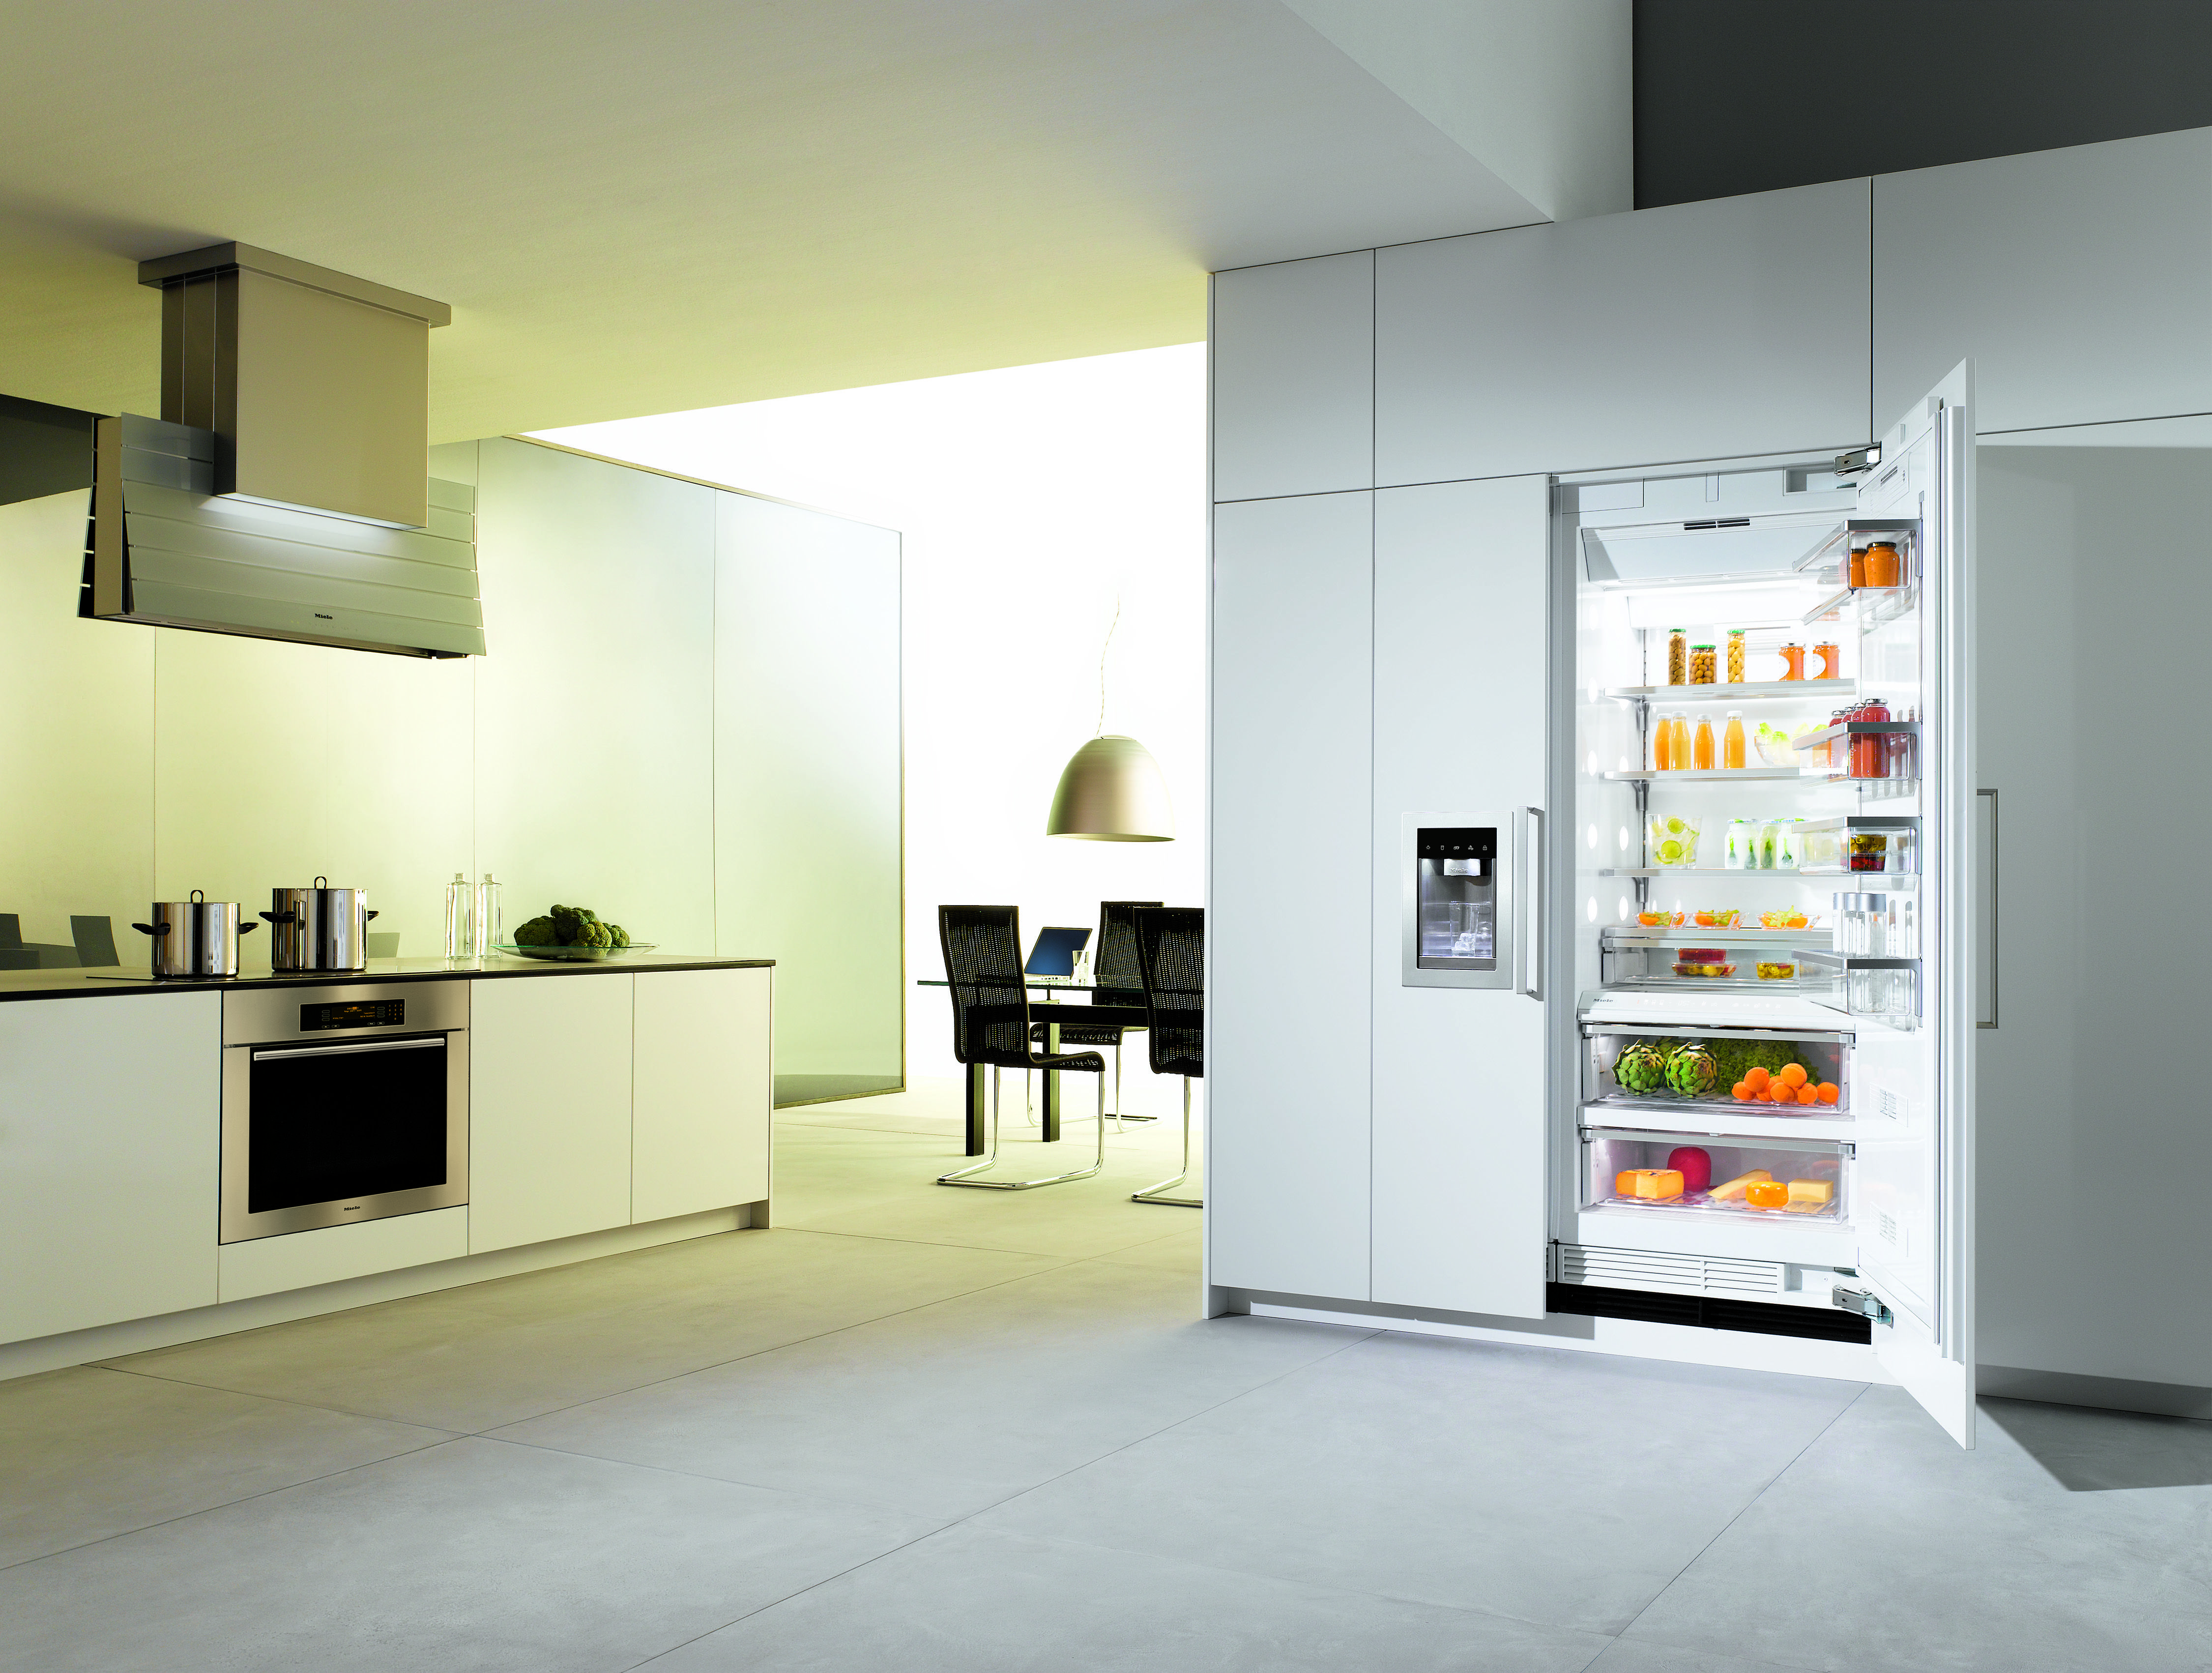 Miele kitchen | Miele kitchen, Miele kitchen appliances